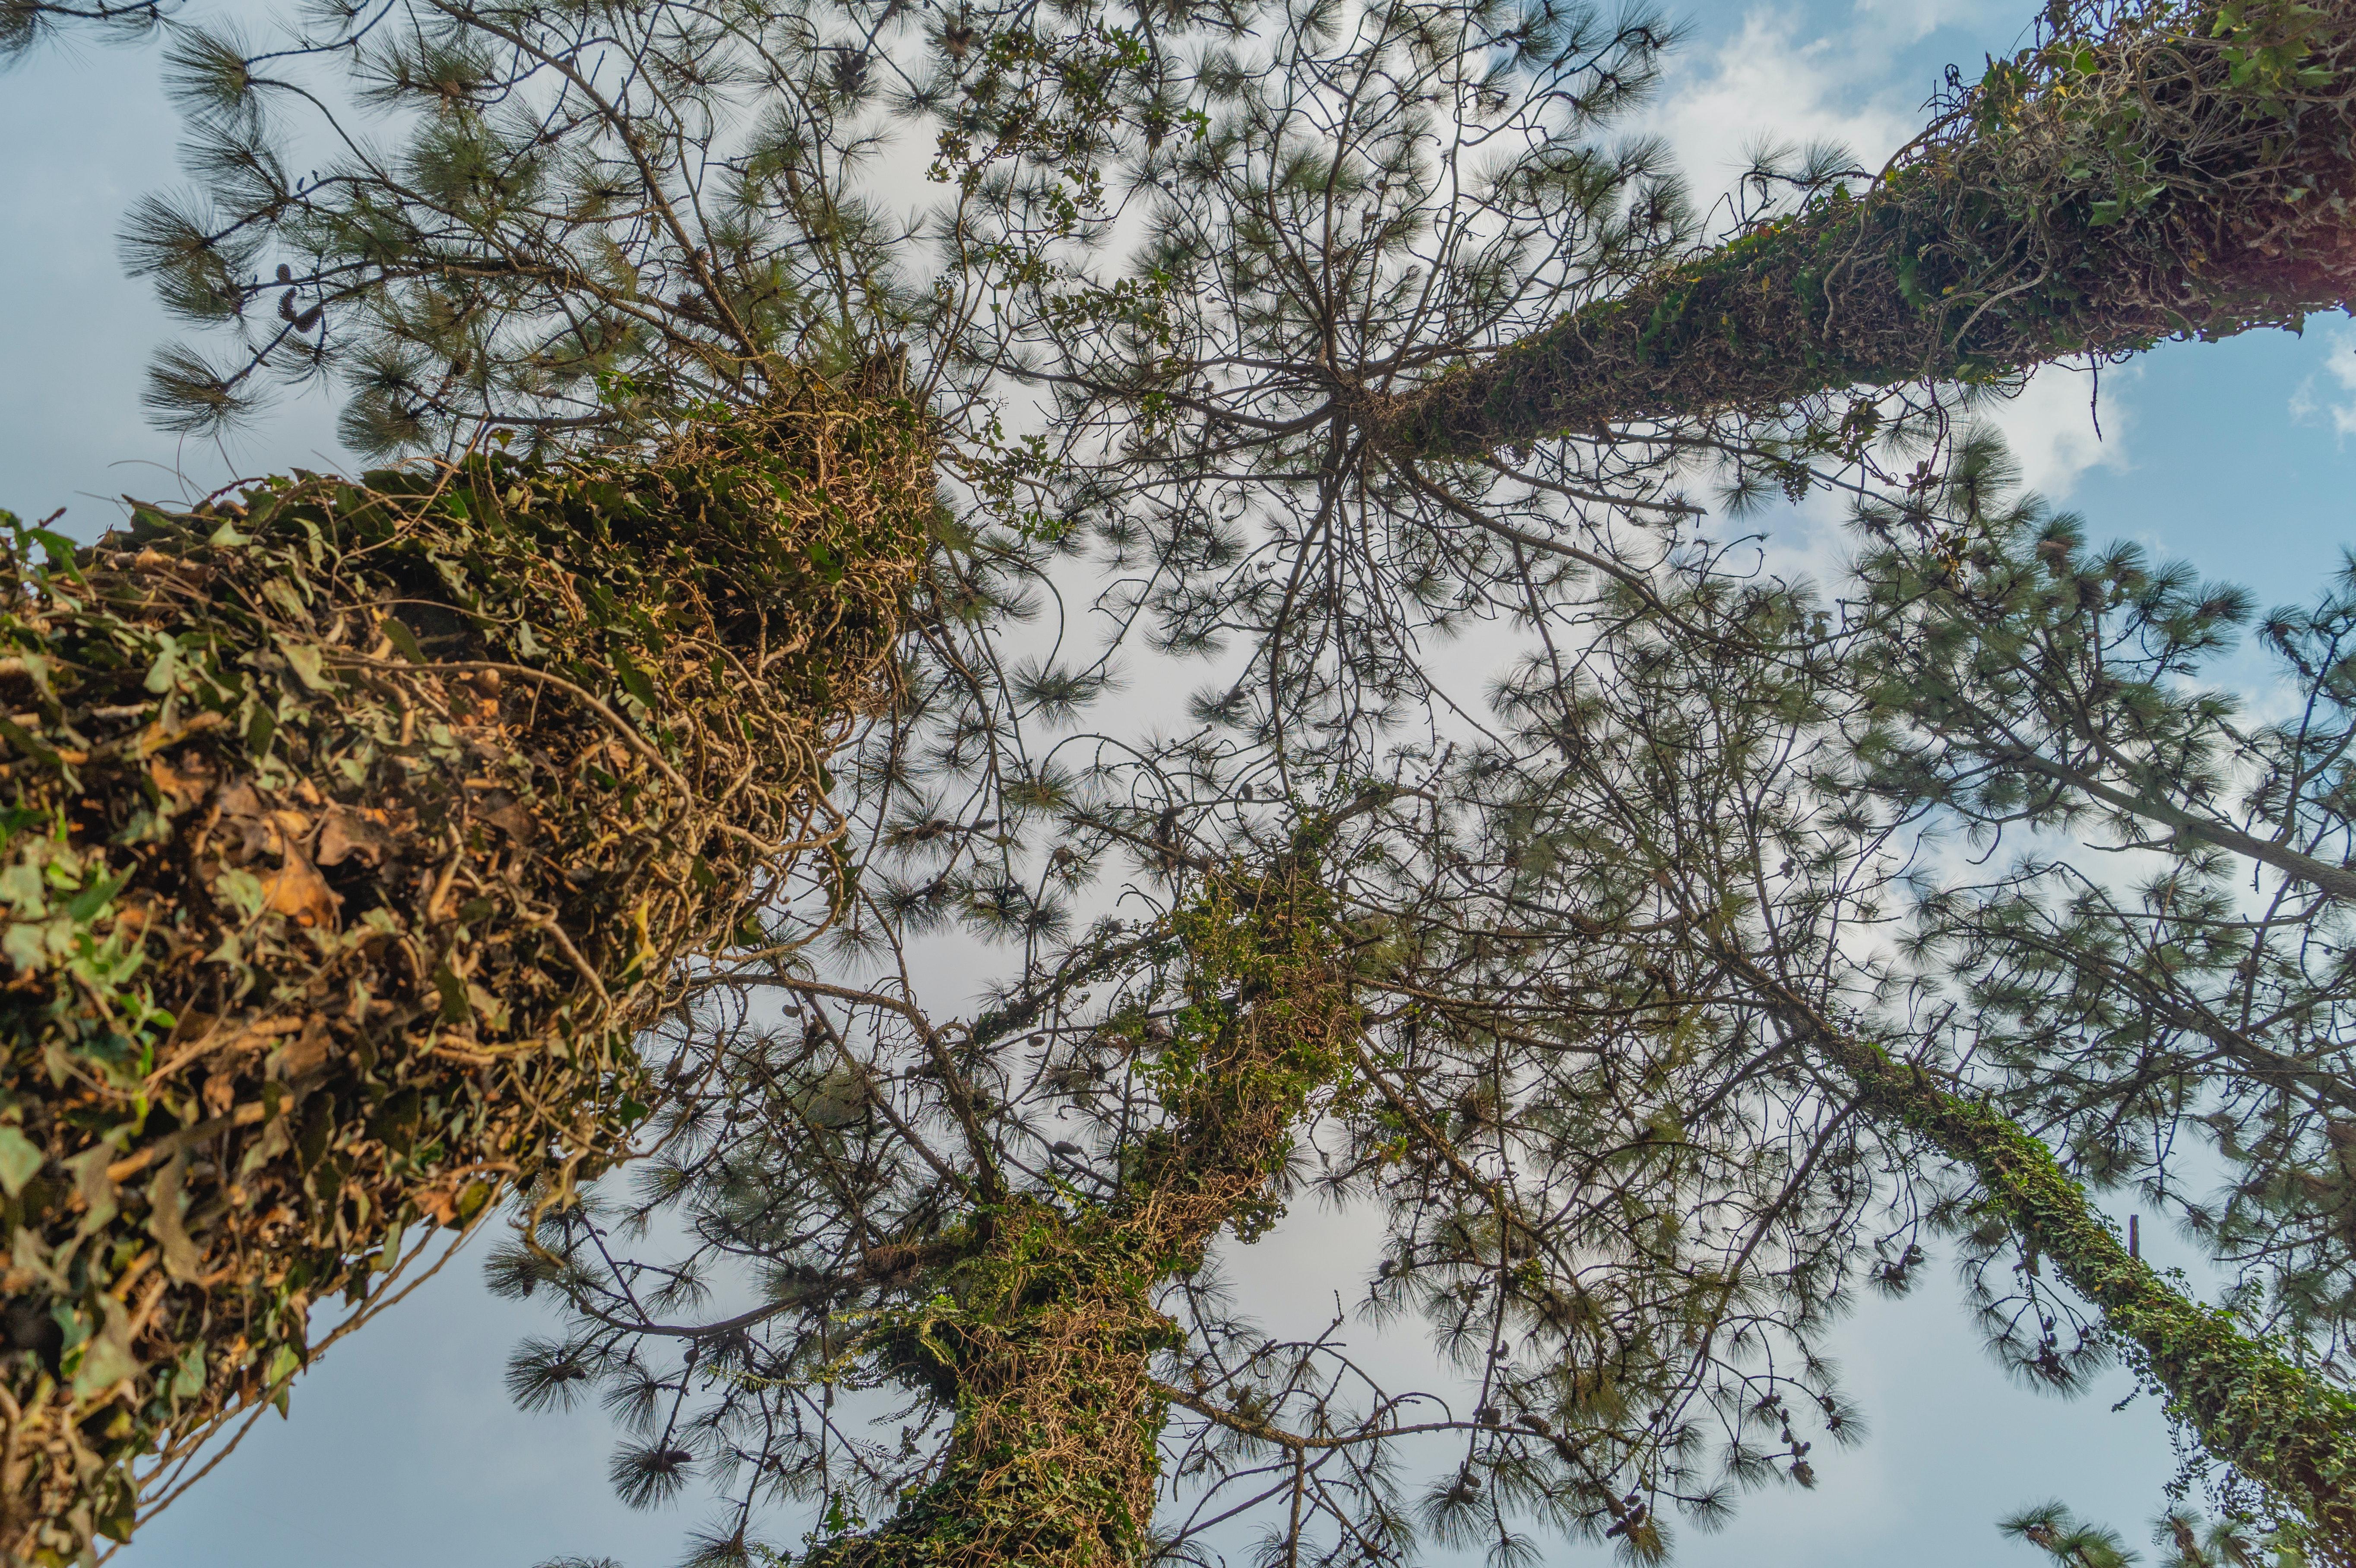 Free stock photo of tall trees, trees